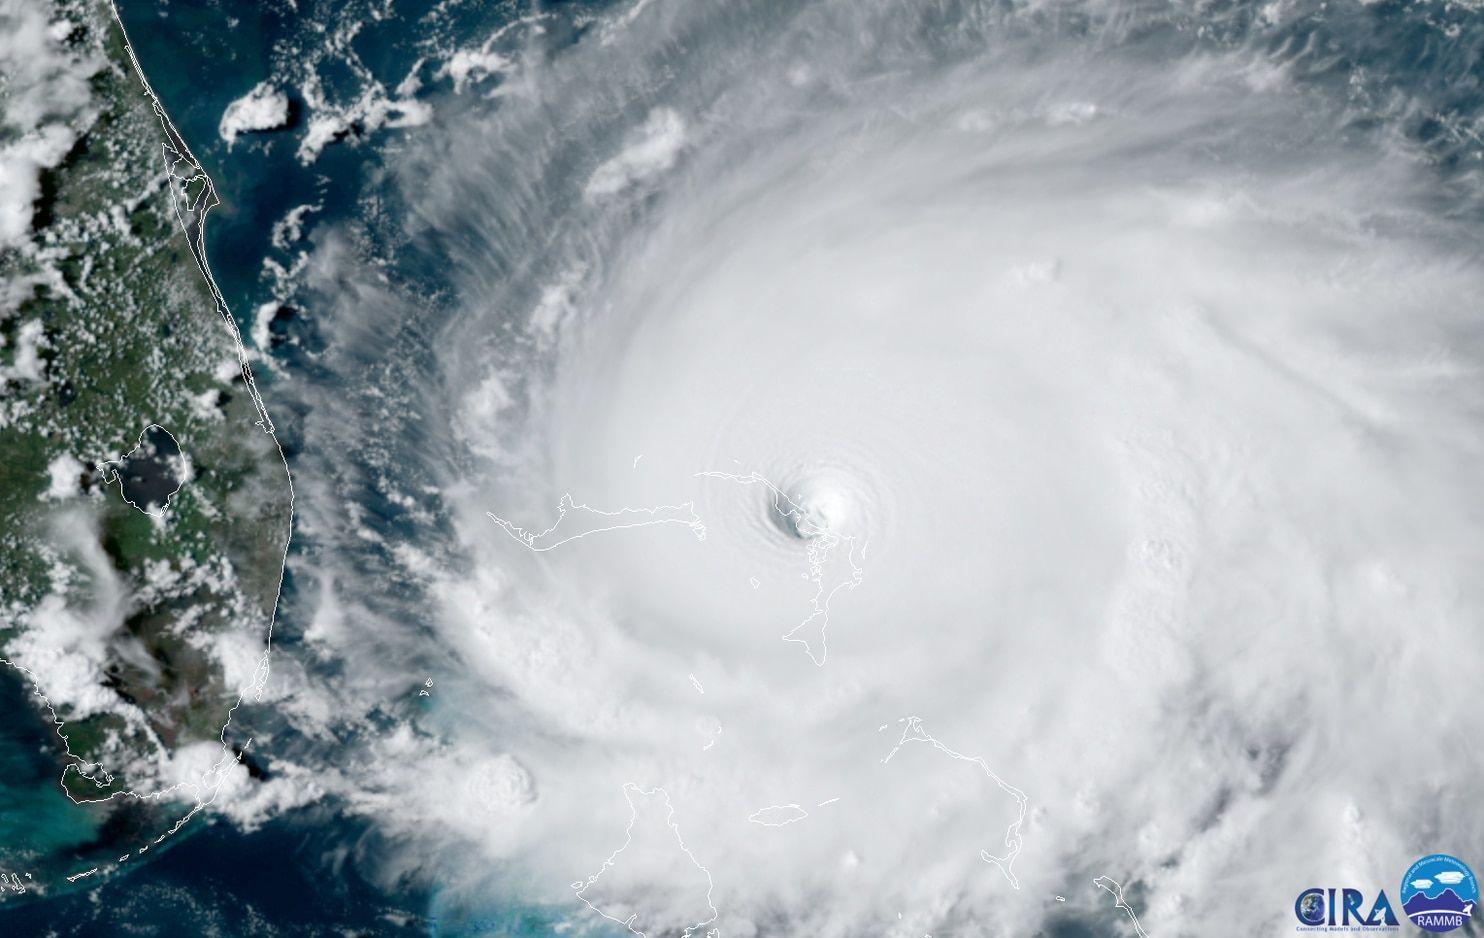 Pin On Environment Science Natural Disaster Impact